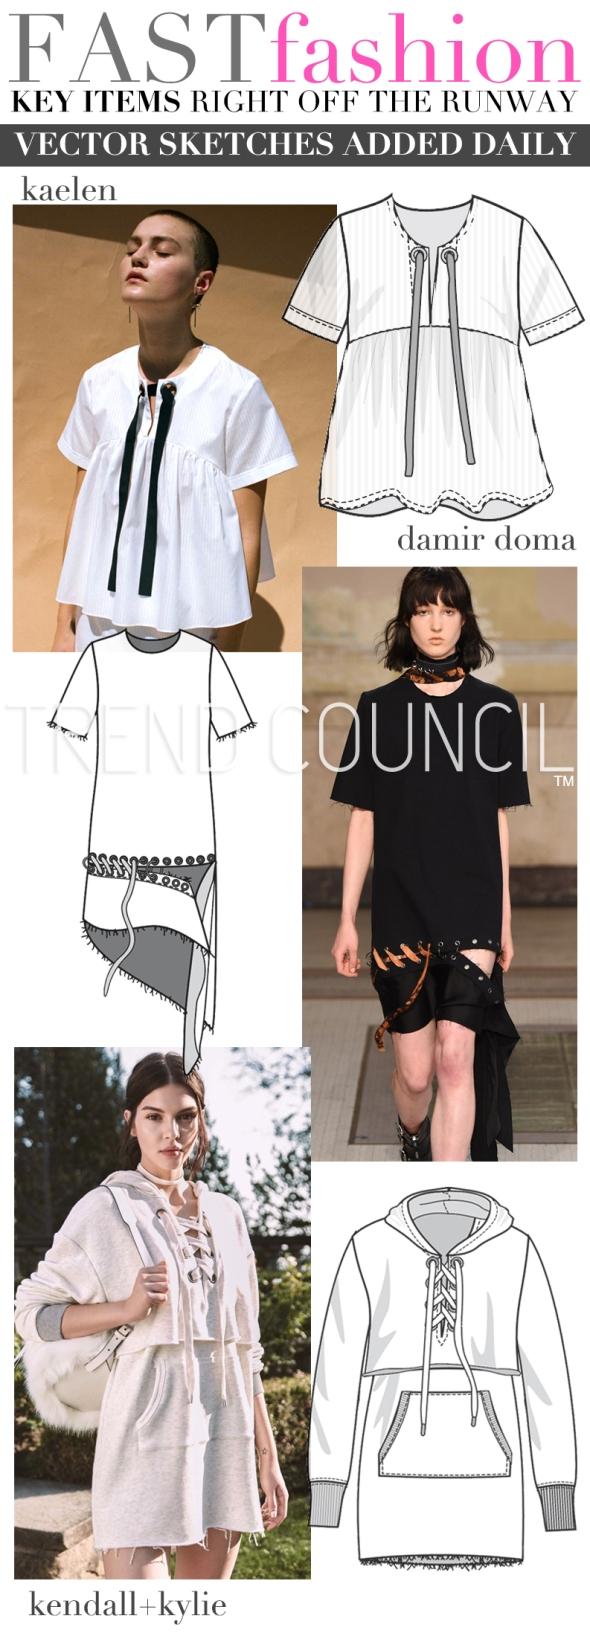 trend-council_lnd